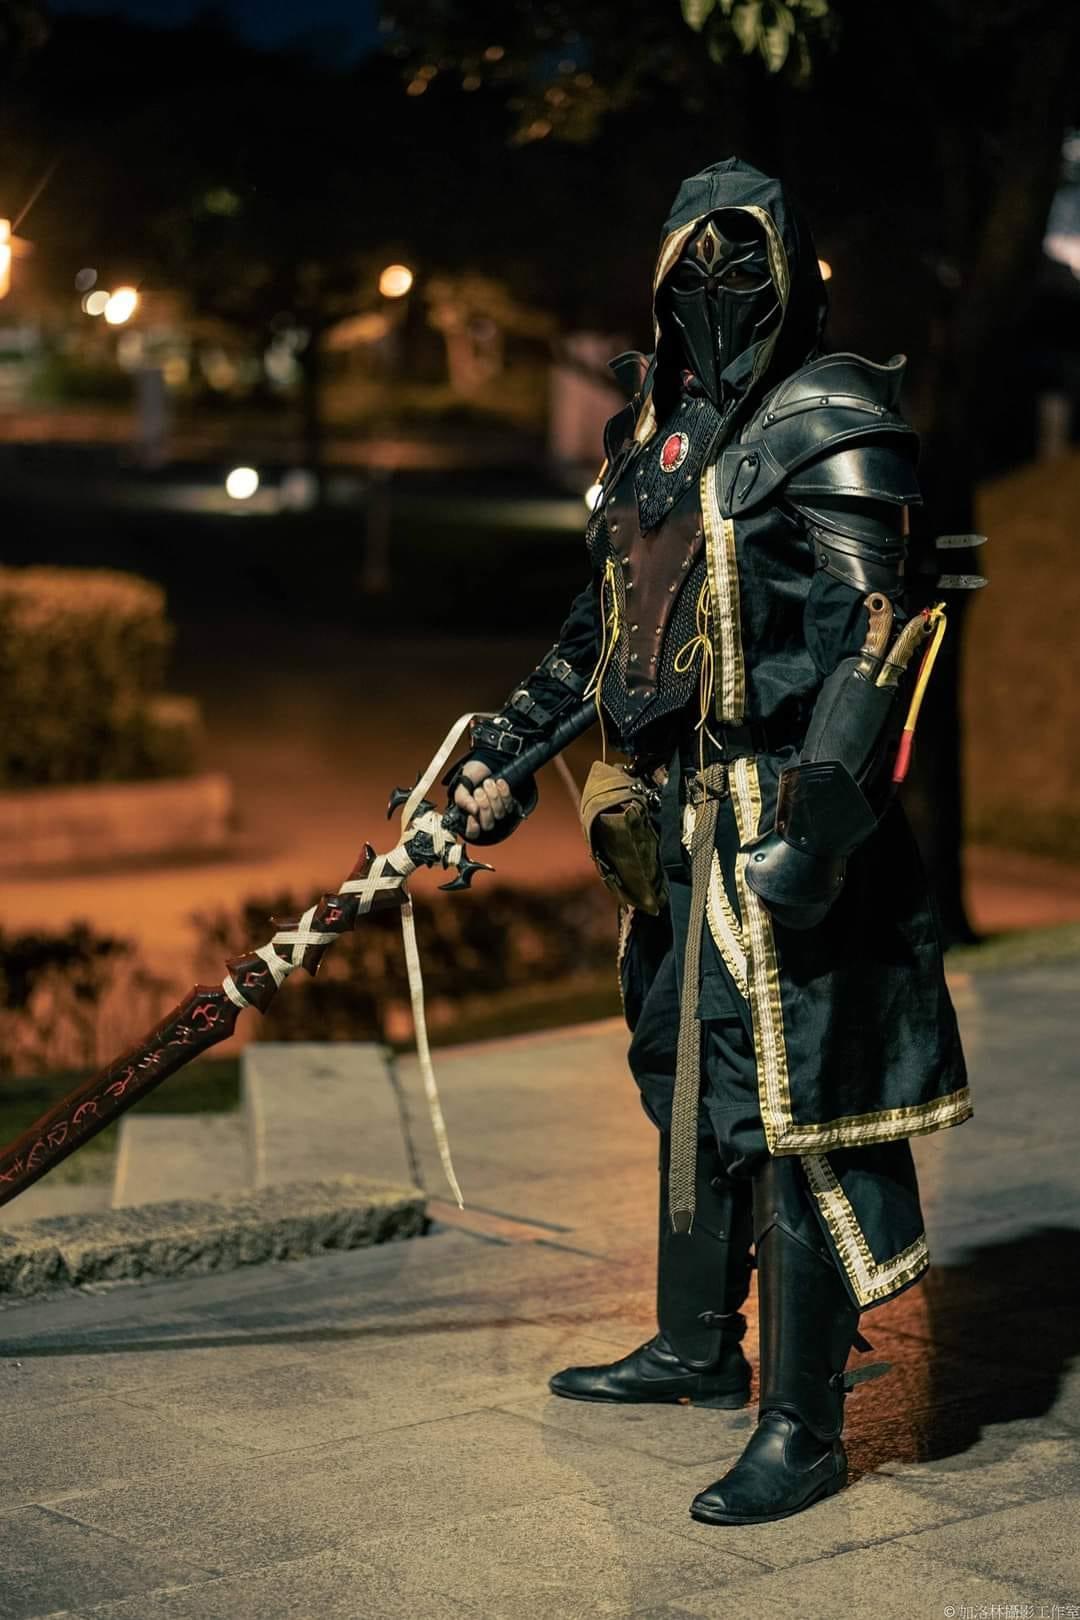 Dark Ominous Armor